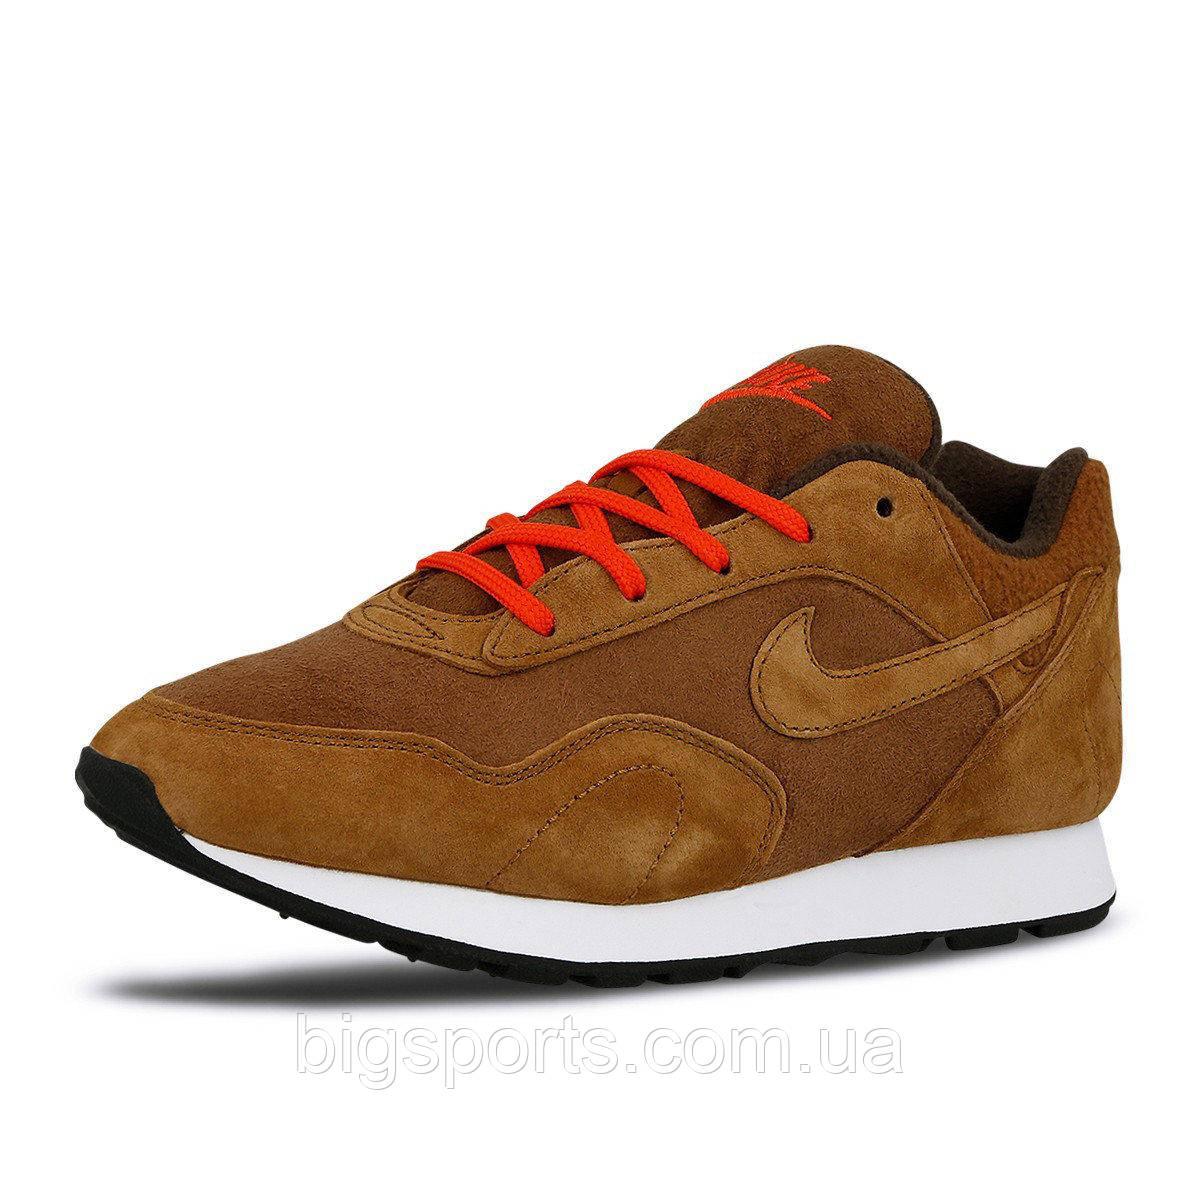 Кроссовки жен. Nike W Outburst Se (арт. AJ8299-200)